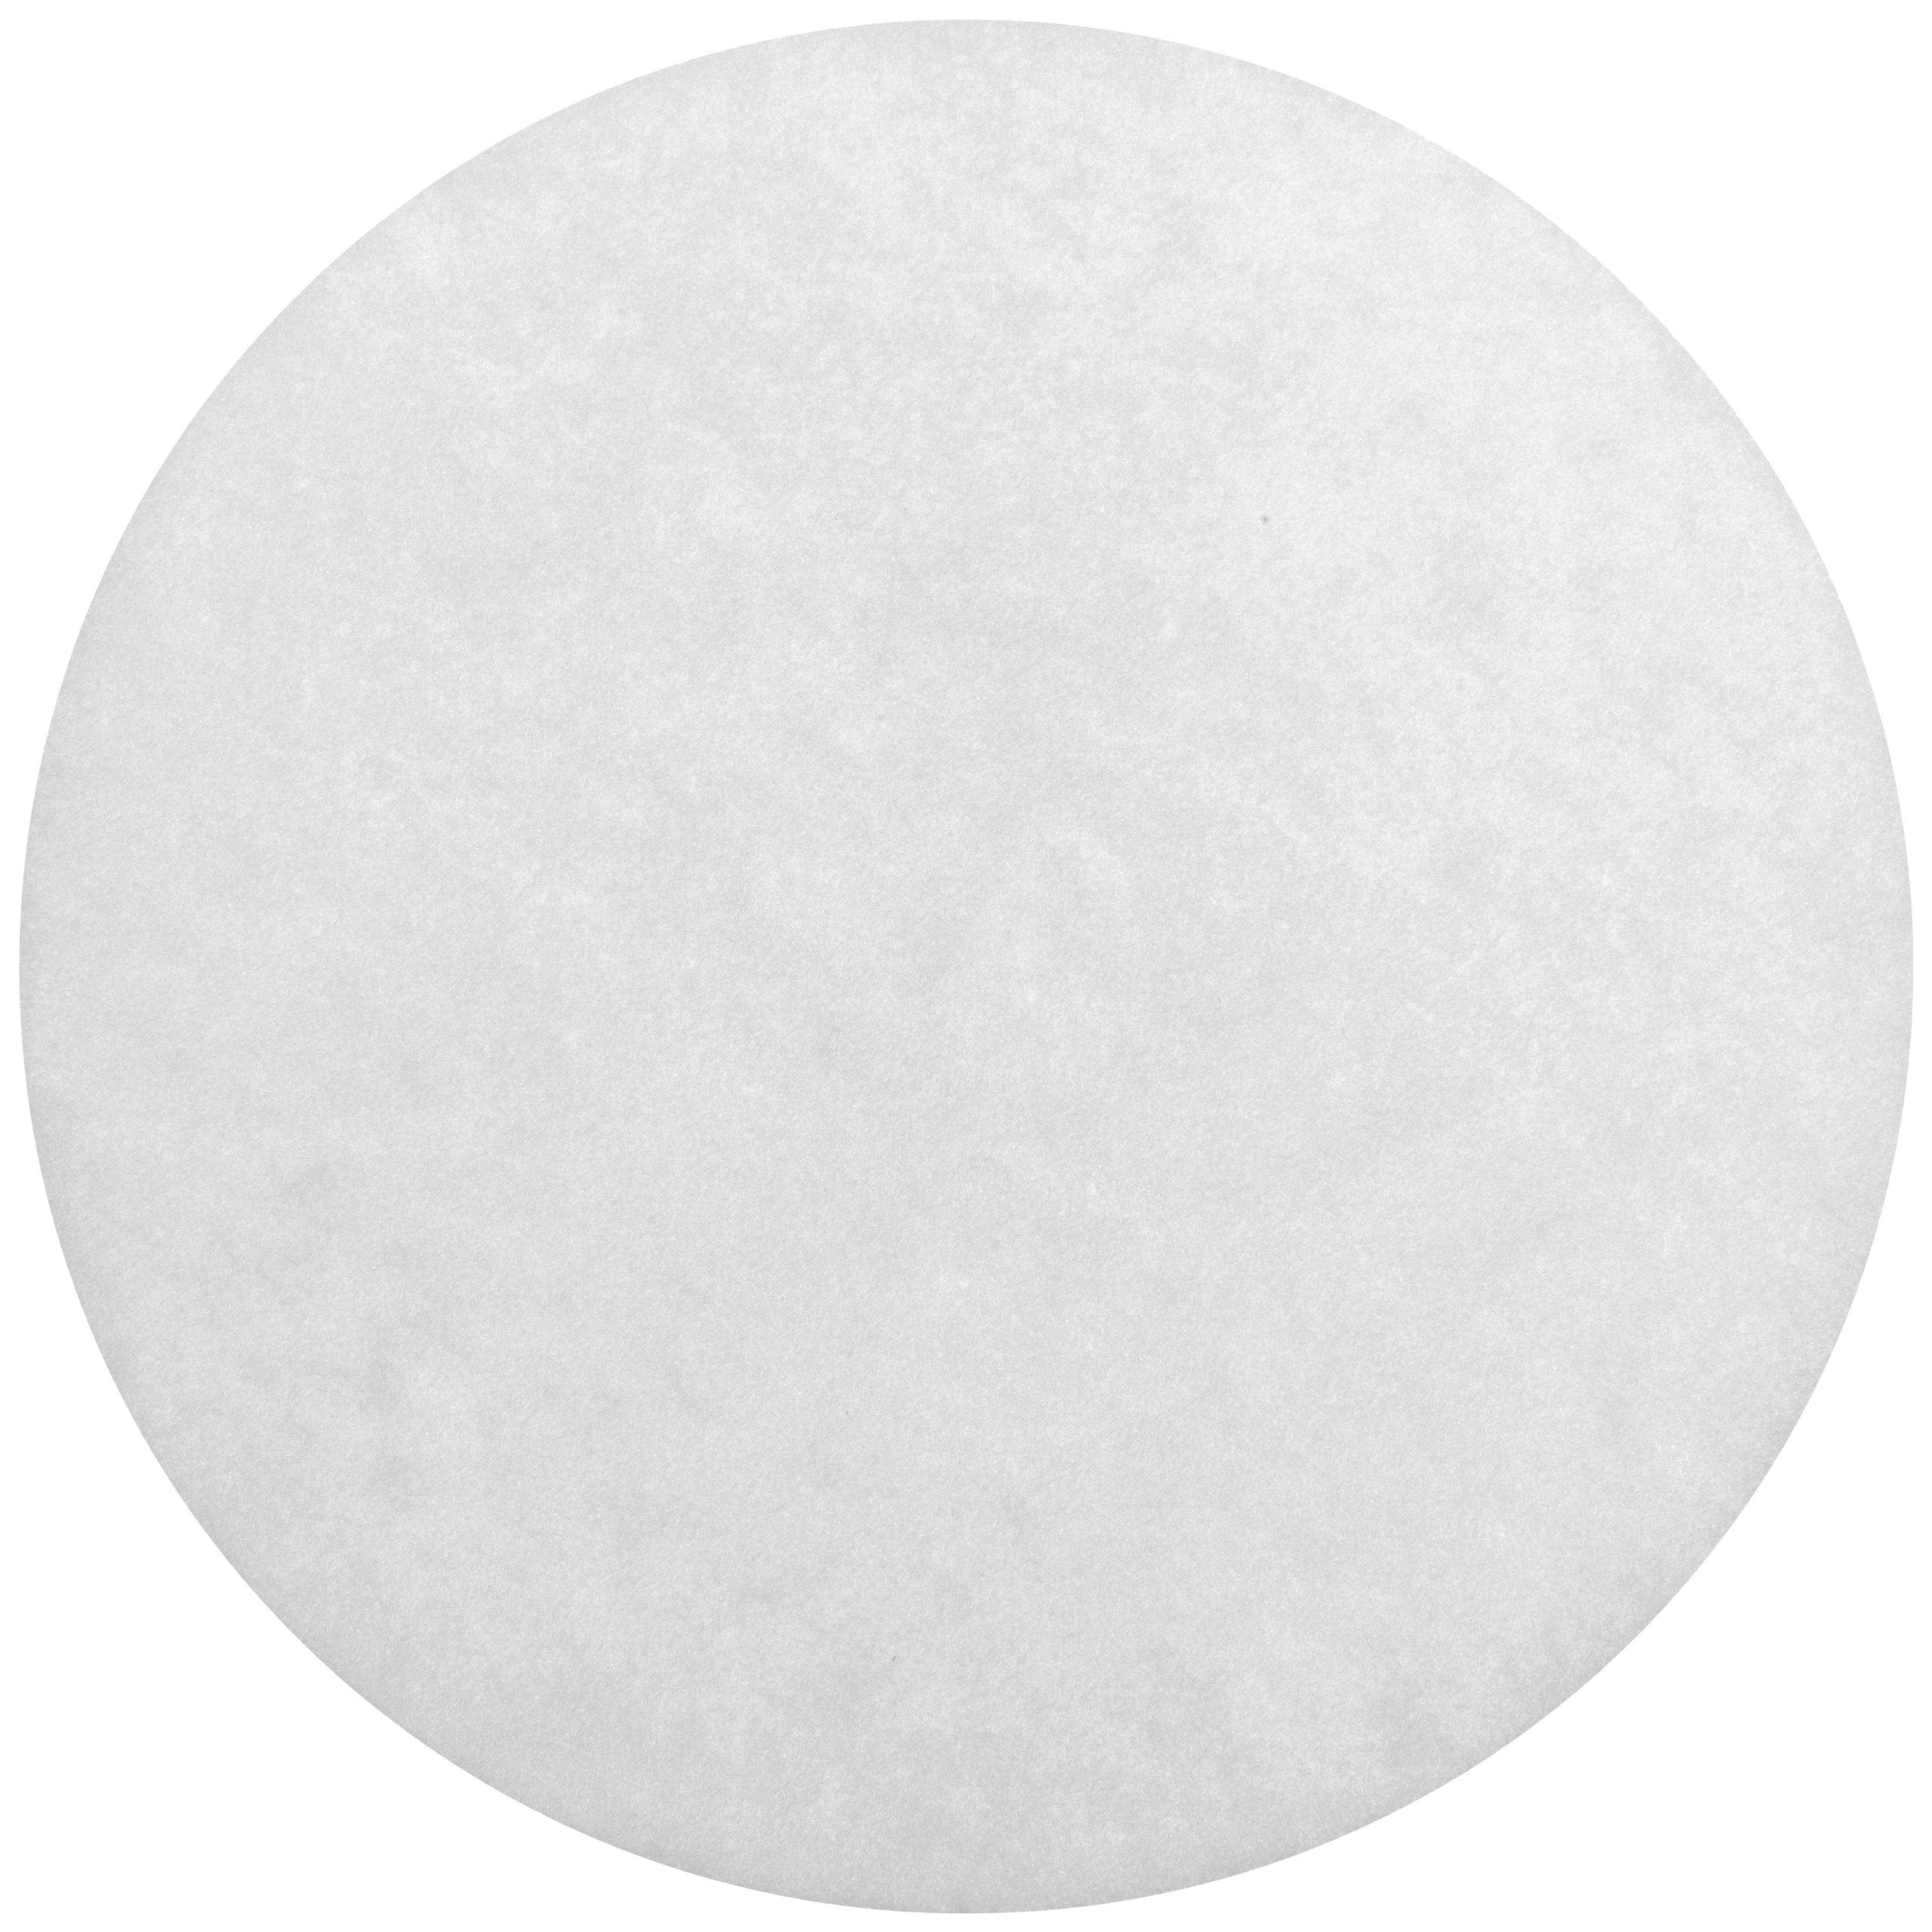 Whatman 1113-240 Quantitative Filter Paper Circles, 30 Micron, 1.3 s/100mL/sq inch Flow Rate, Grade 113, 240mm Diameter (Pack of 100) by Whatman